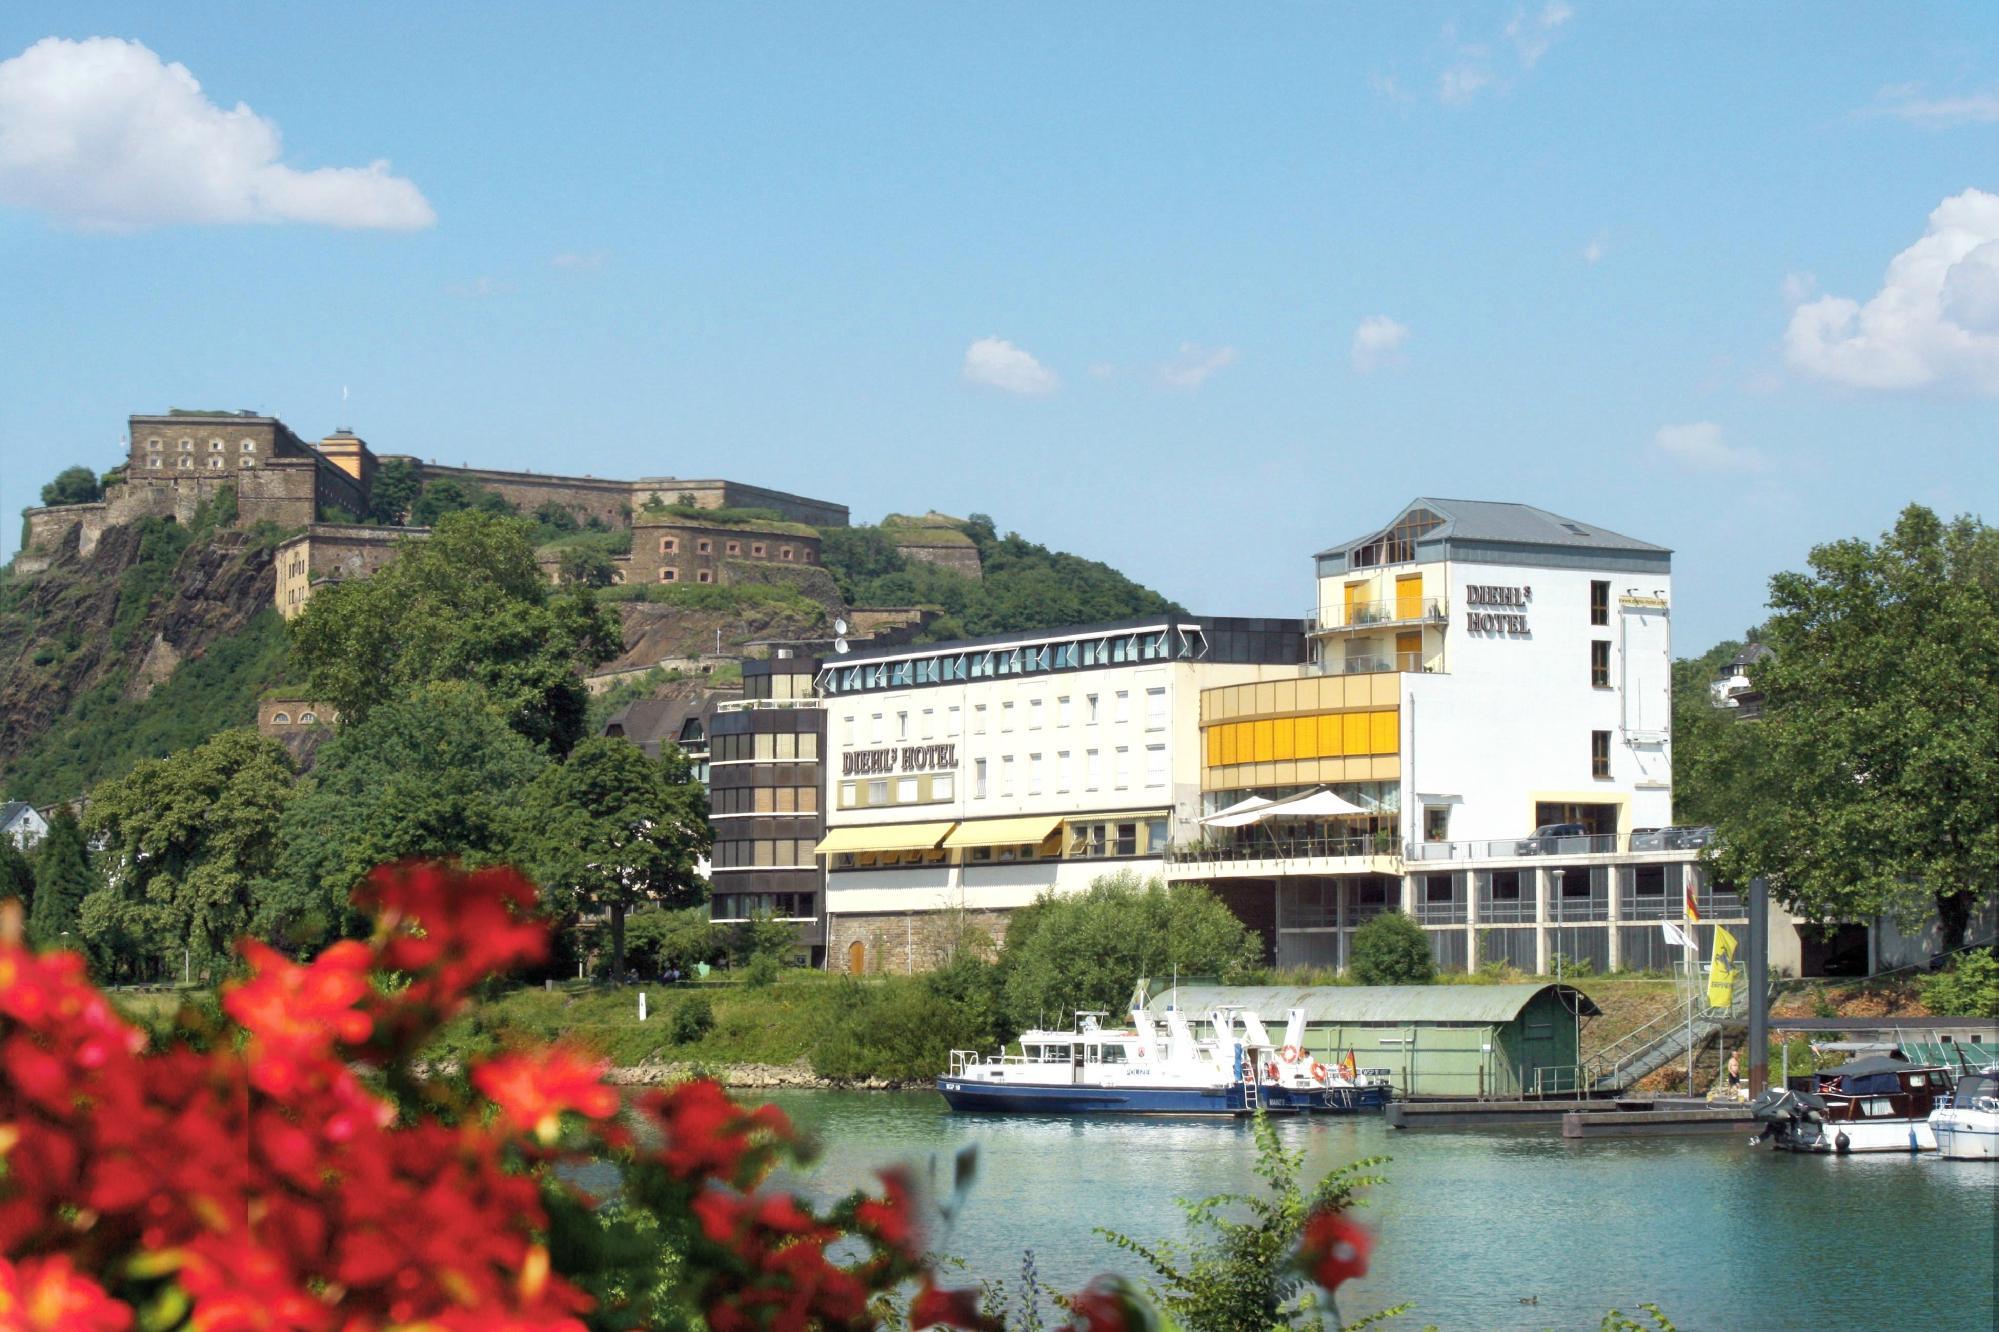 German Castles Germany Medieval Castle Hotels 2018 2019